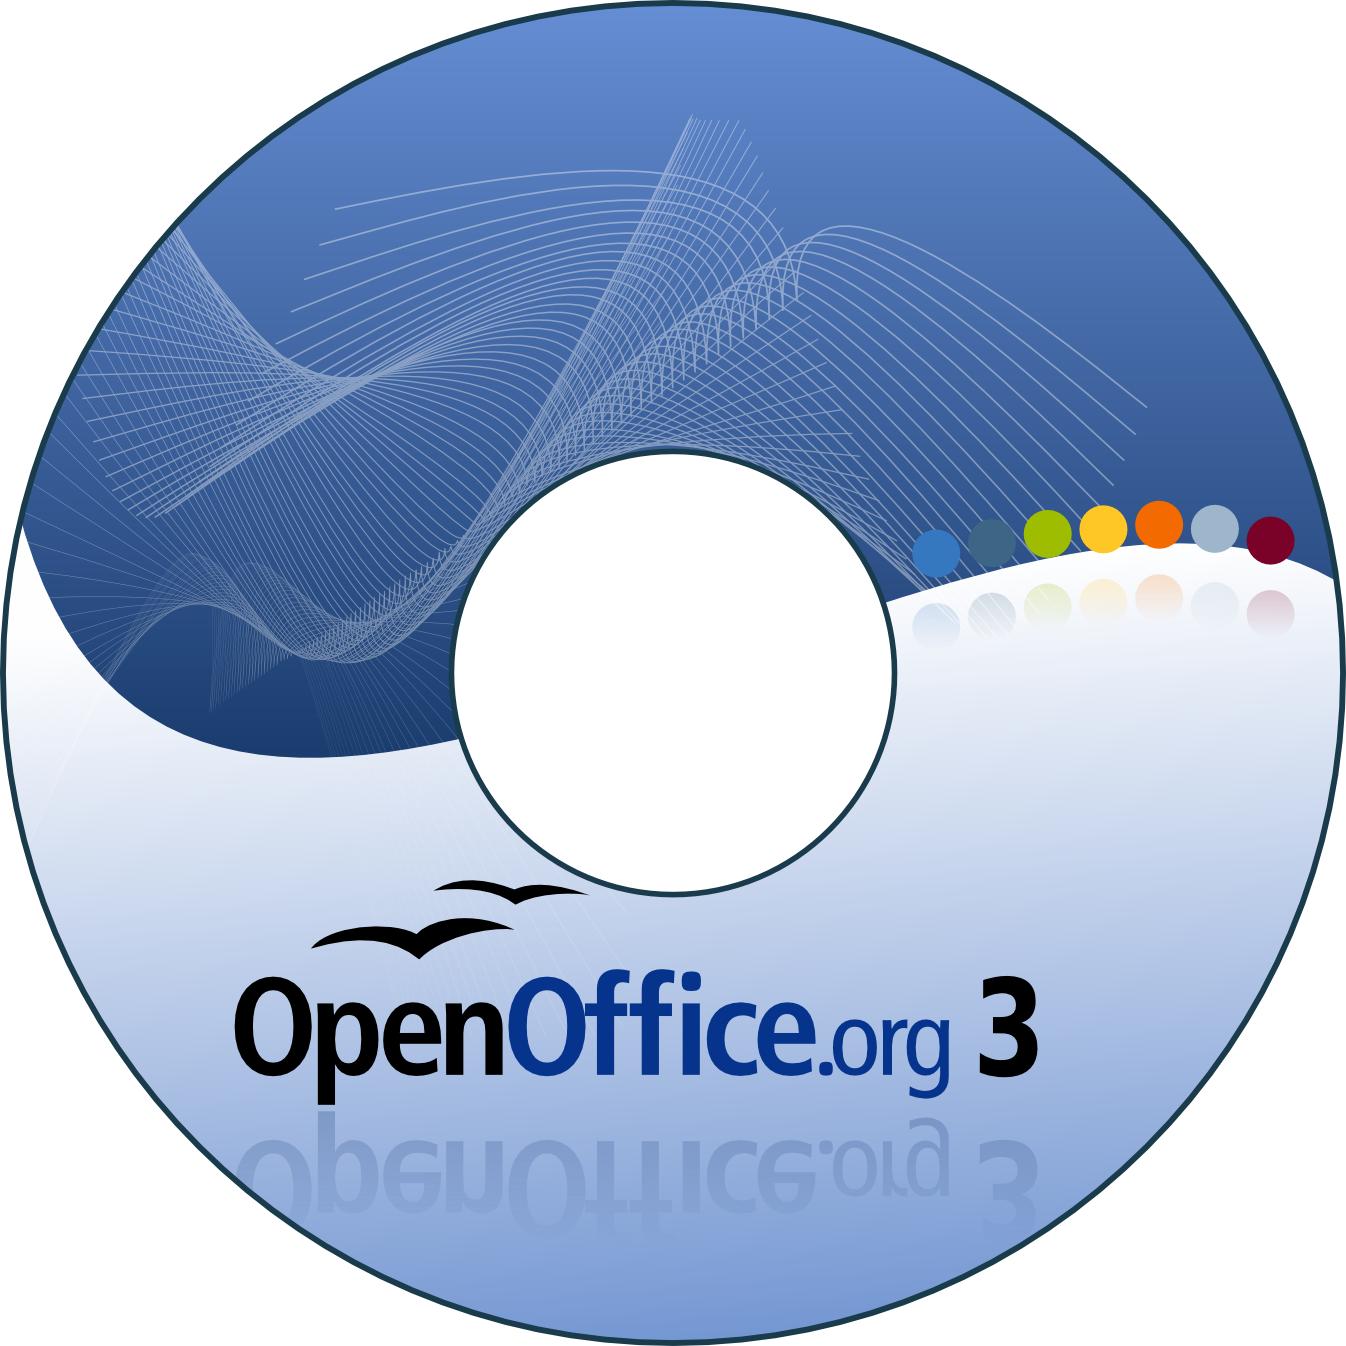 OpenOffice.CD Art previous versions